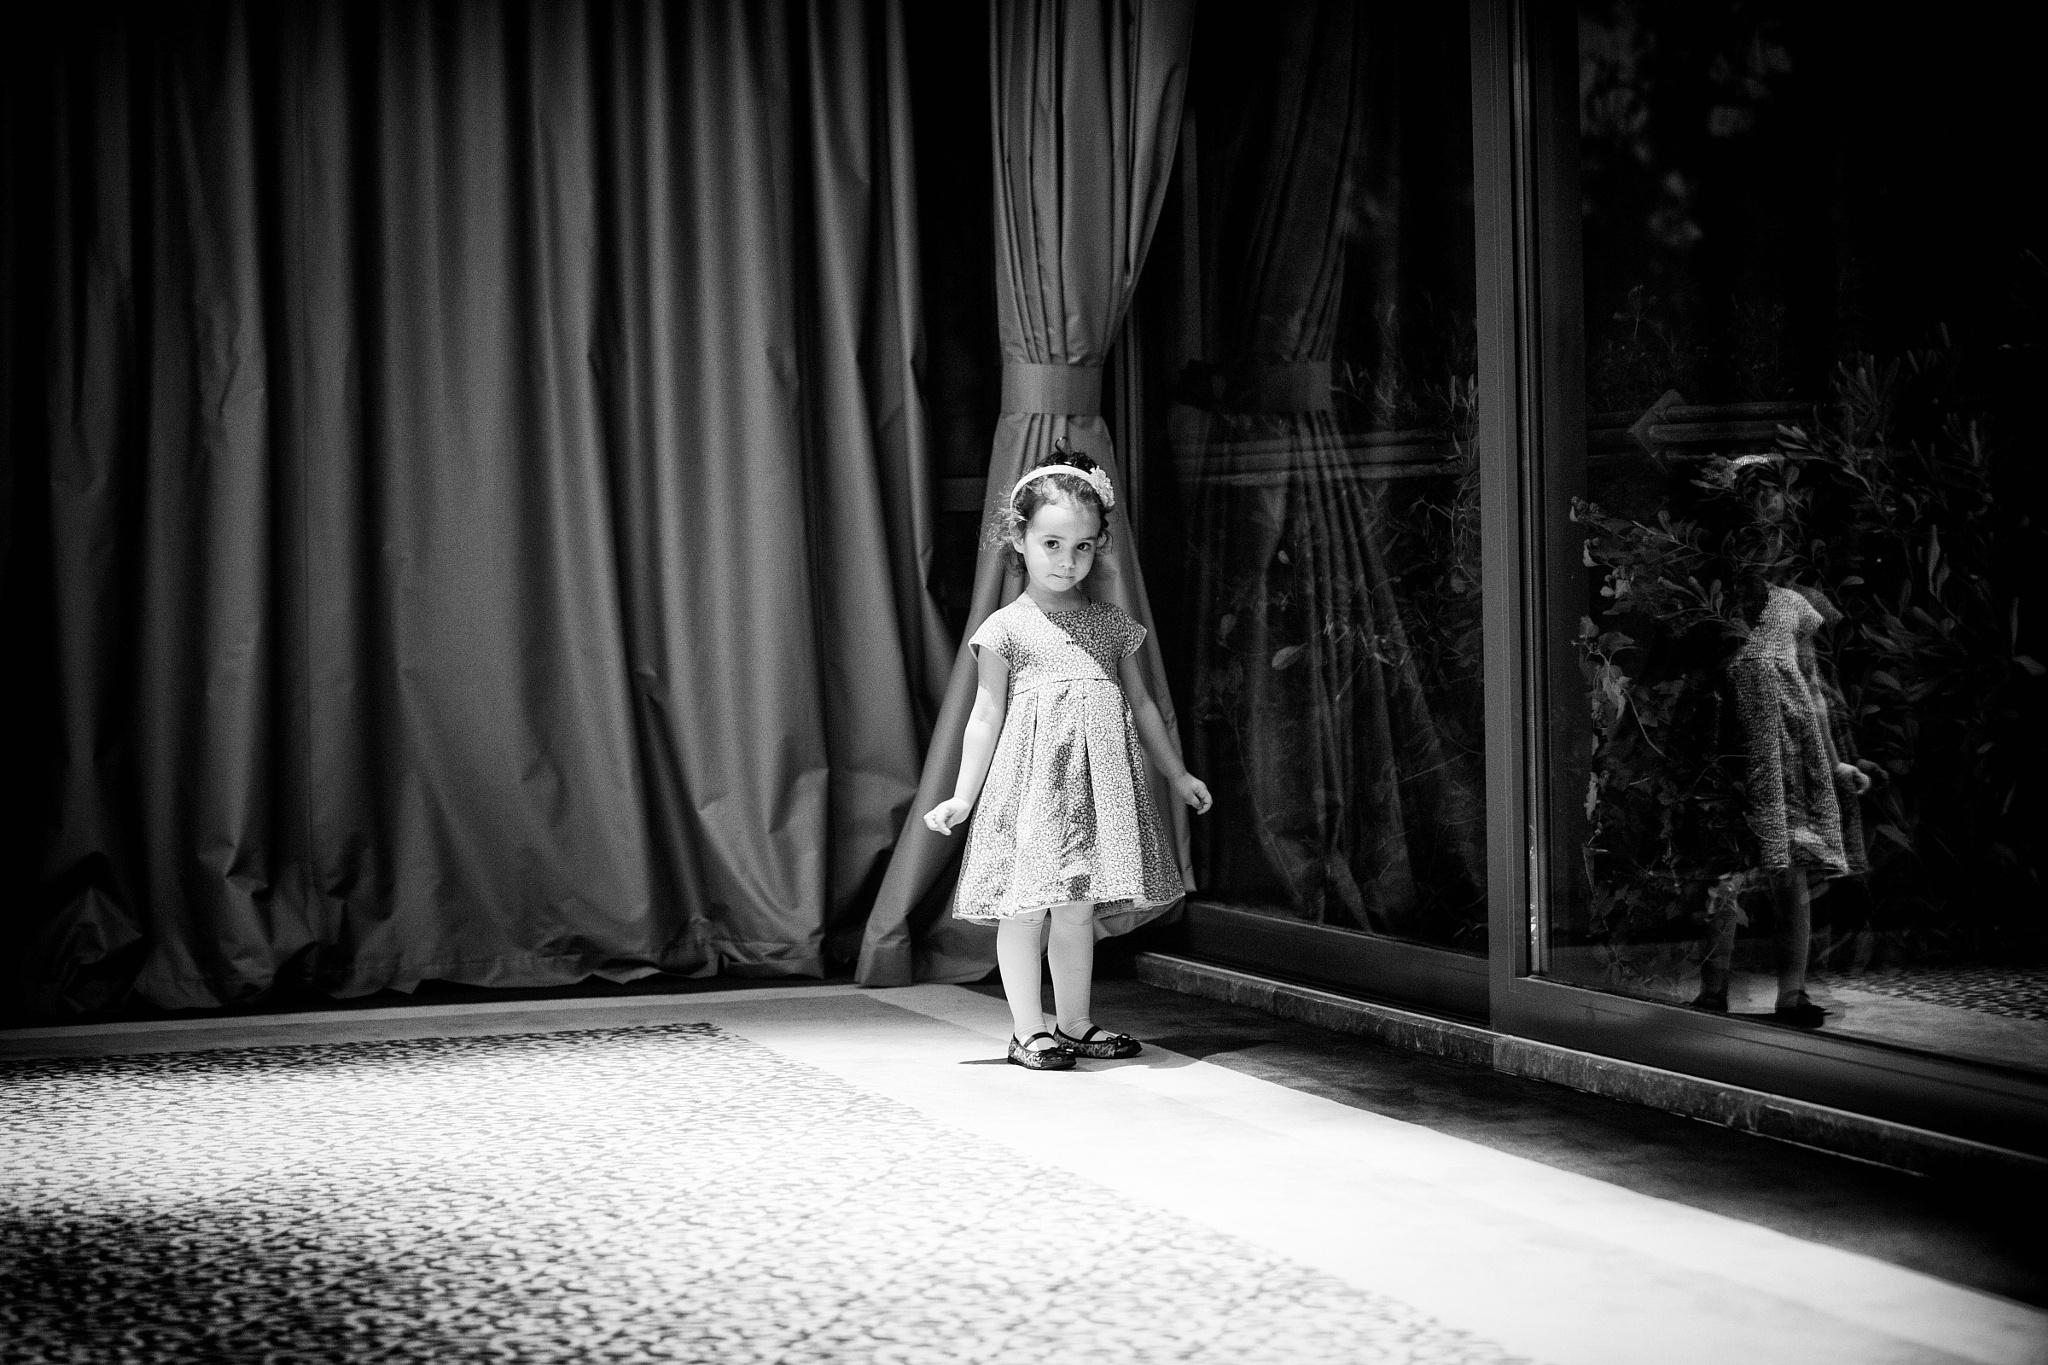 Maria by Markos Kyprianos